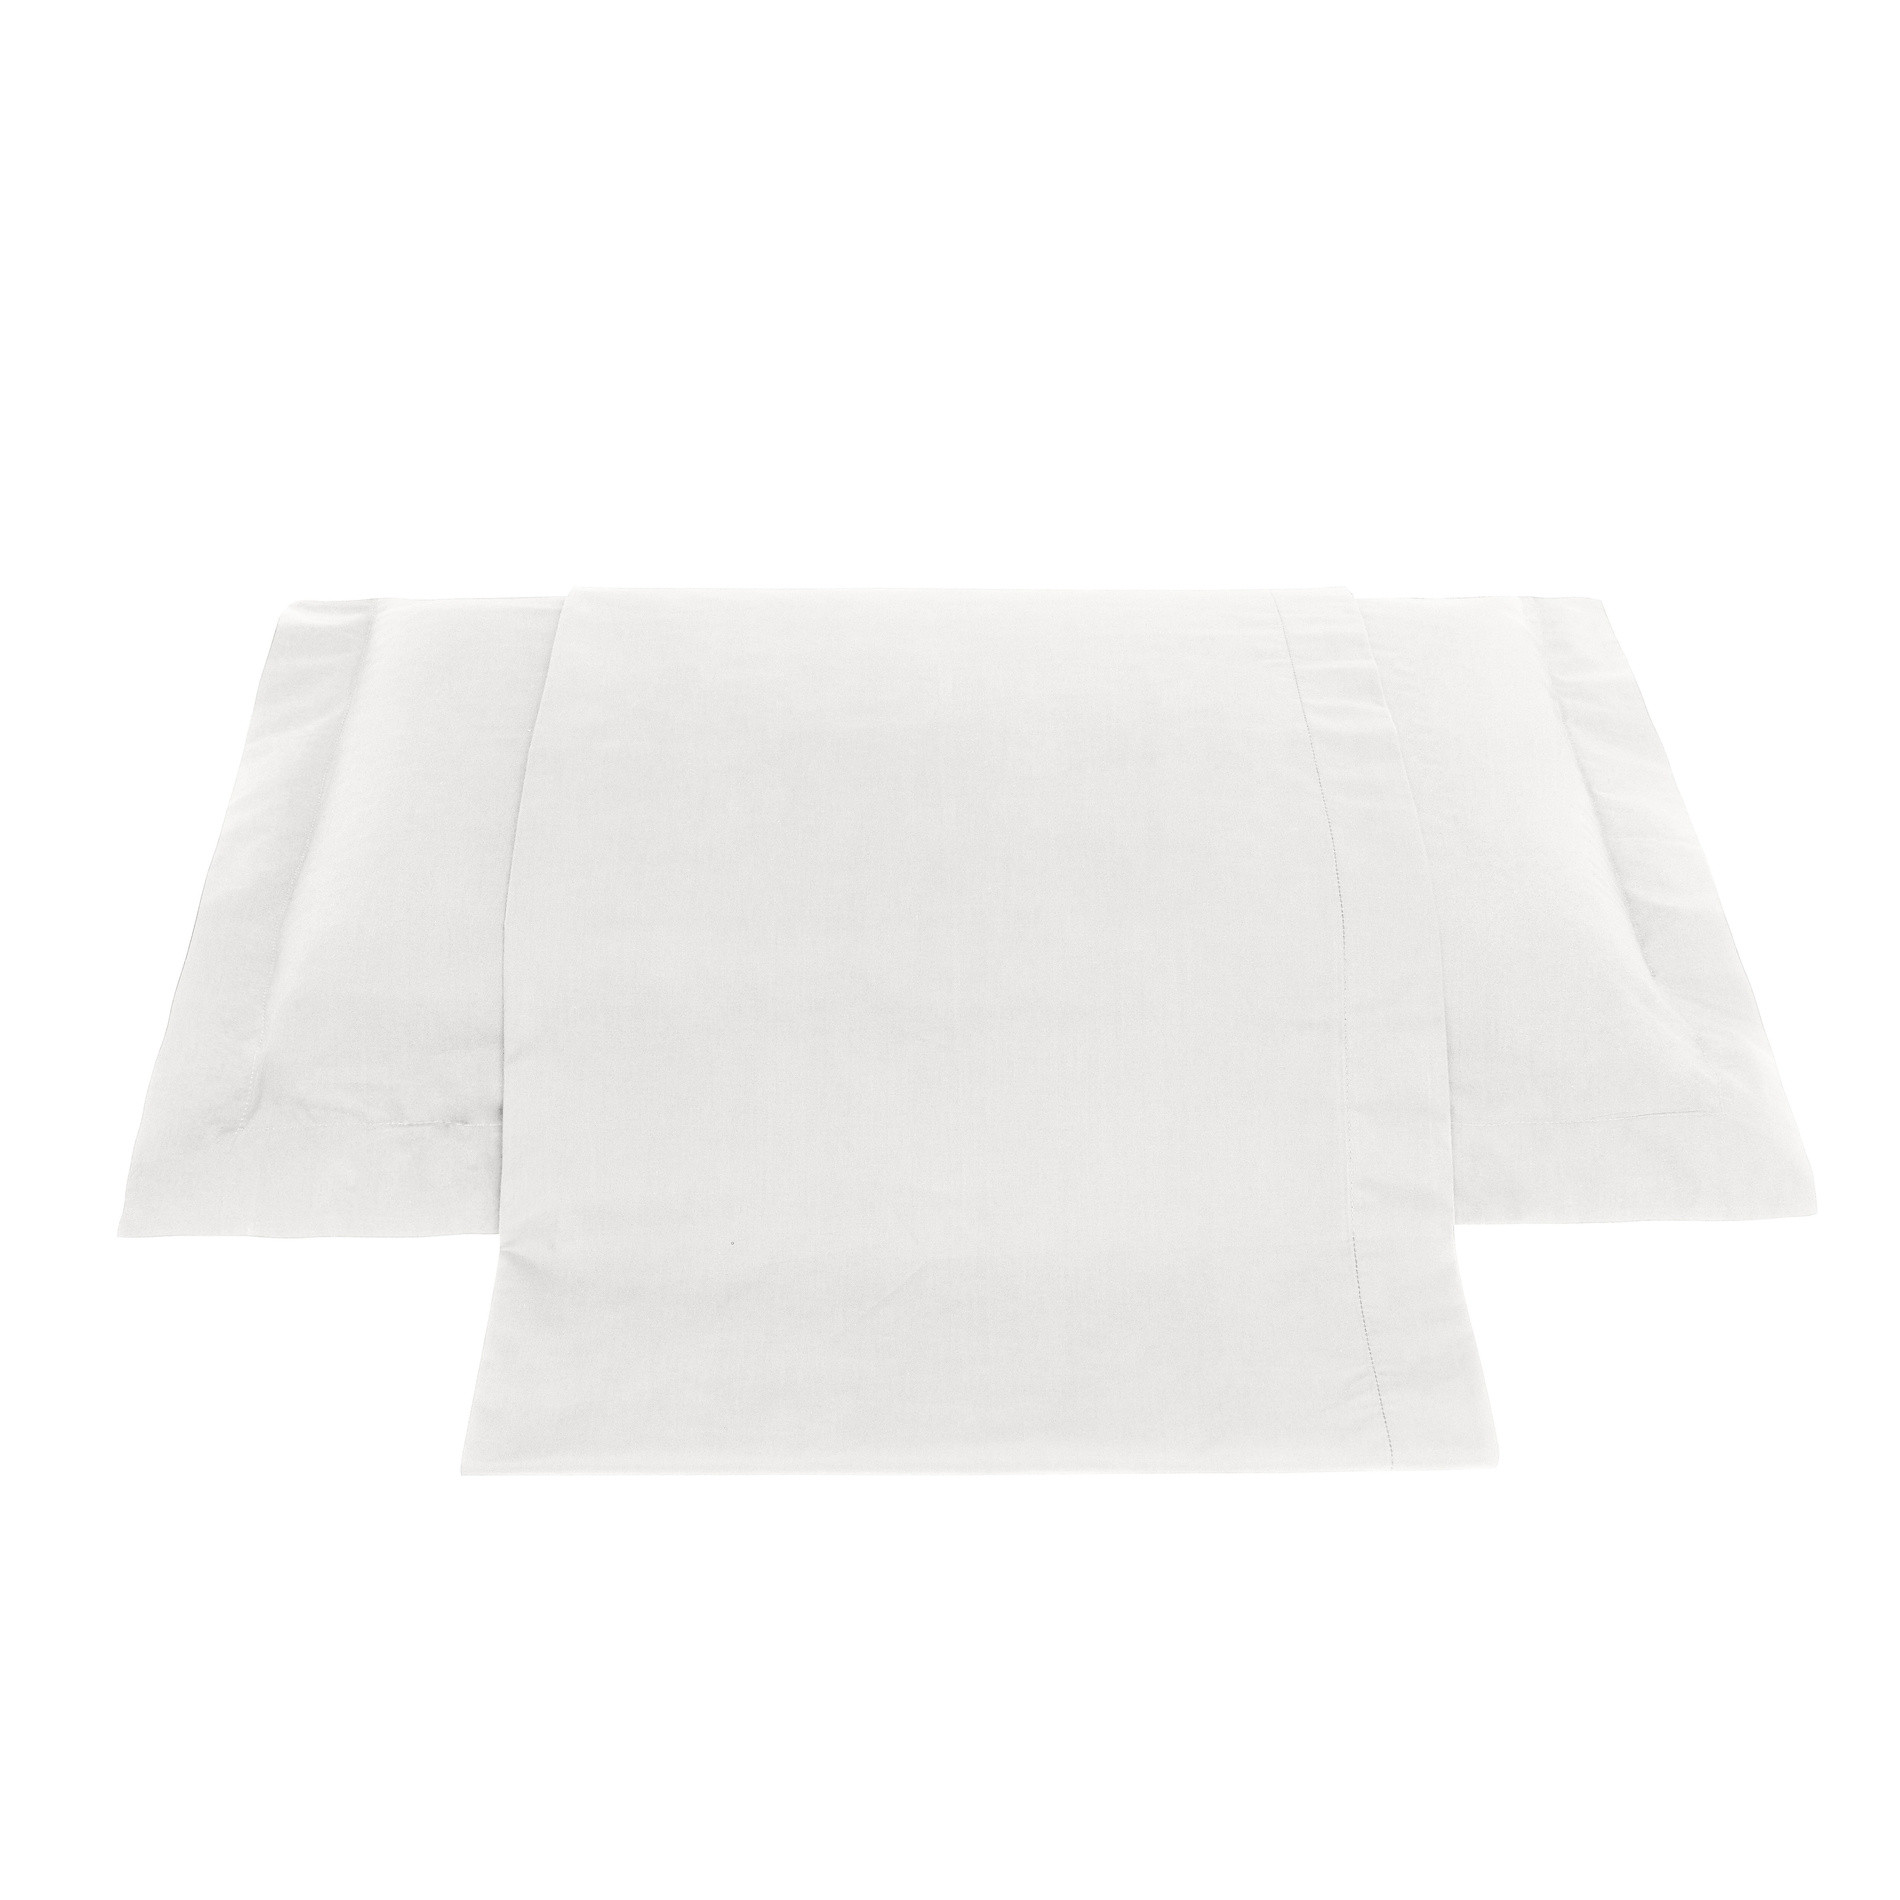 Lenzuolo liscio in percalle tinta unita Zefiro, Bianco, large image number 0